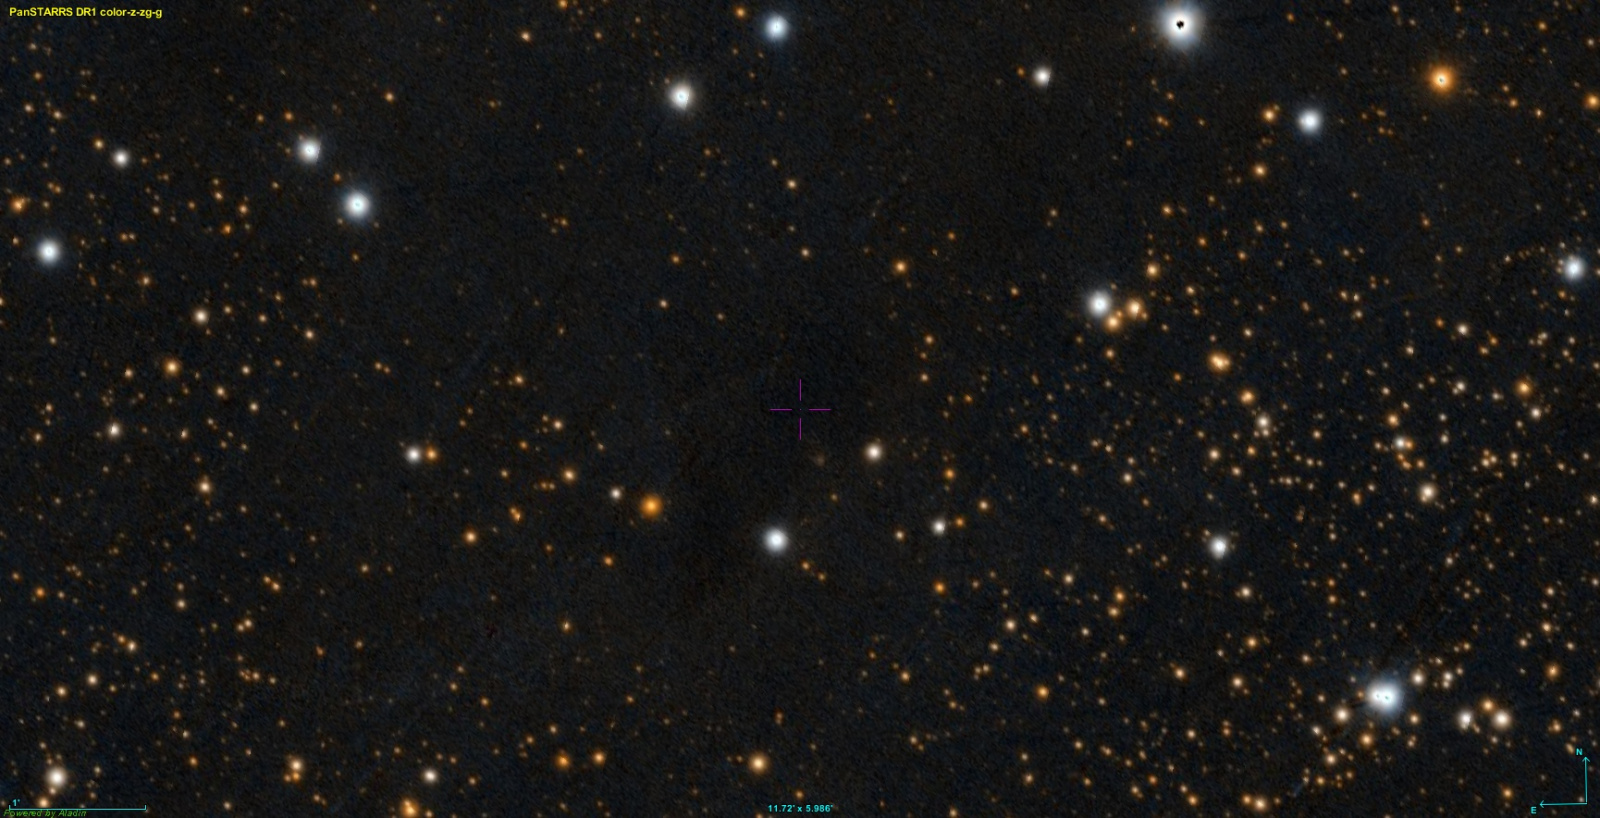 Pan-STARRS-DR1.thumb.jpg.ee4273a8a318f8d6ccf777329dbfba5c.jpg